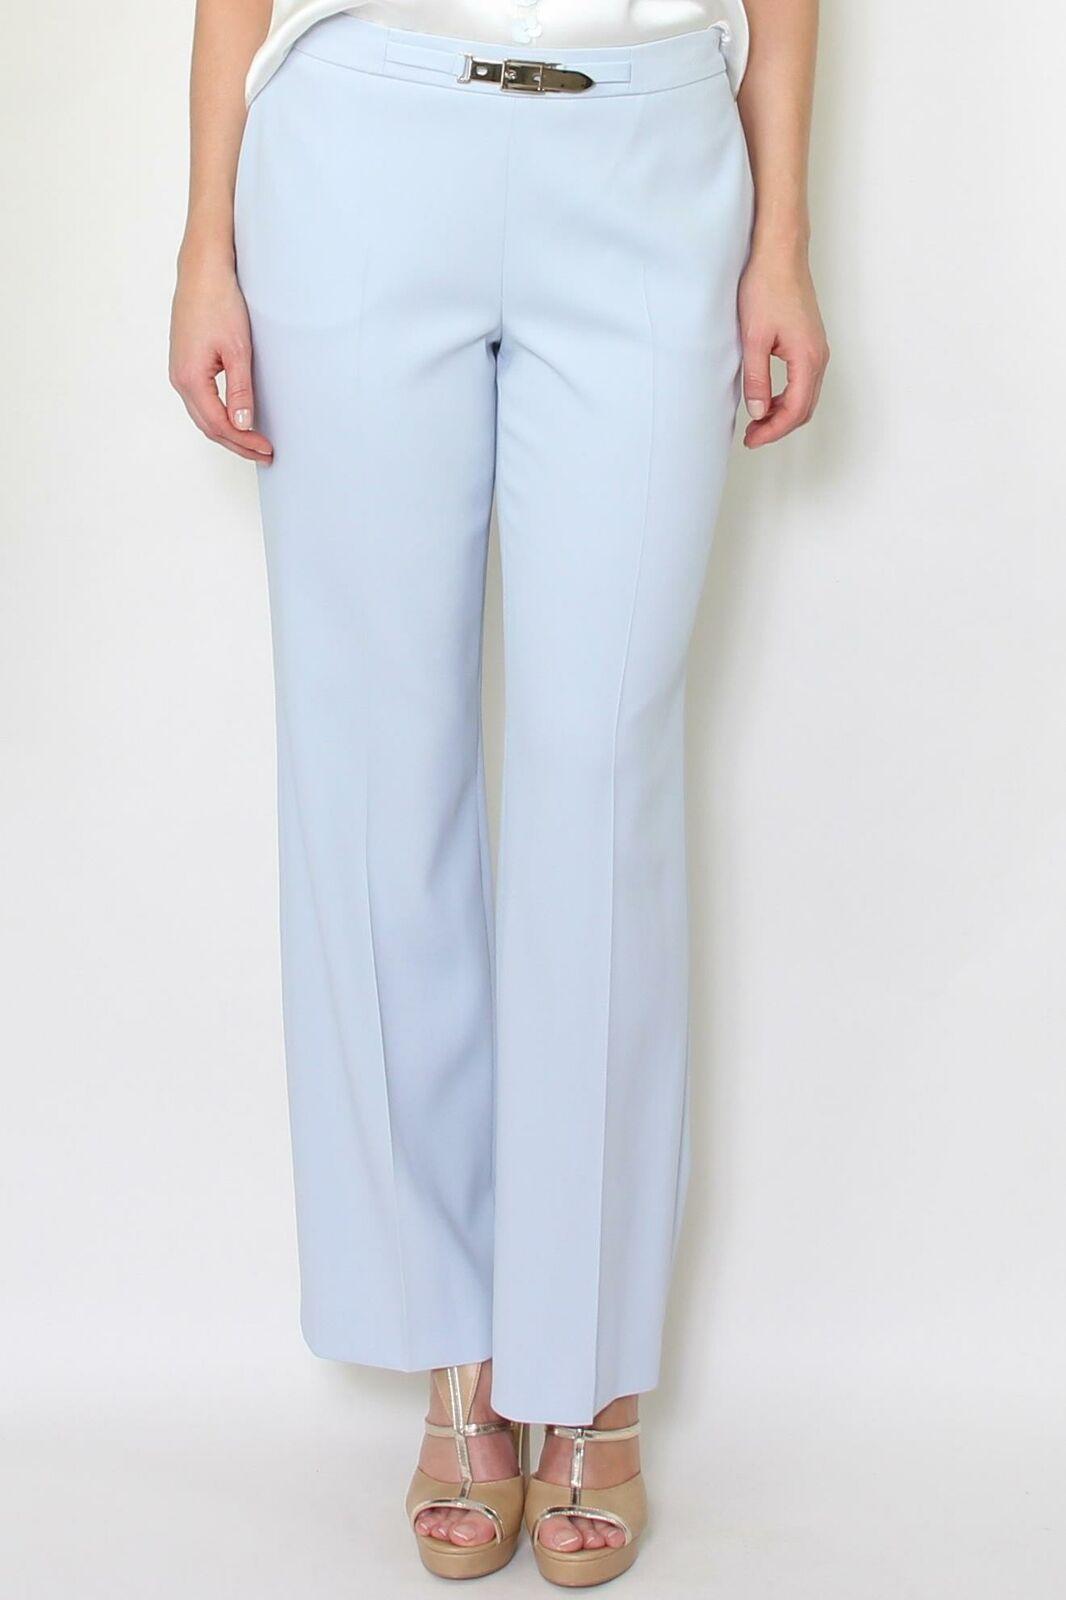 Guido Maria Kretschmer - Minna Hose blau Damen Business trousers